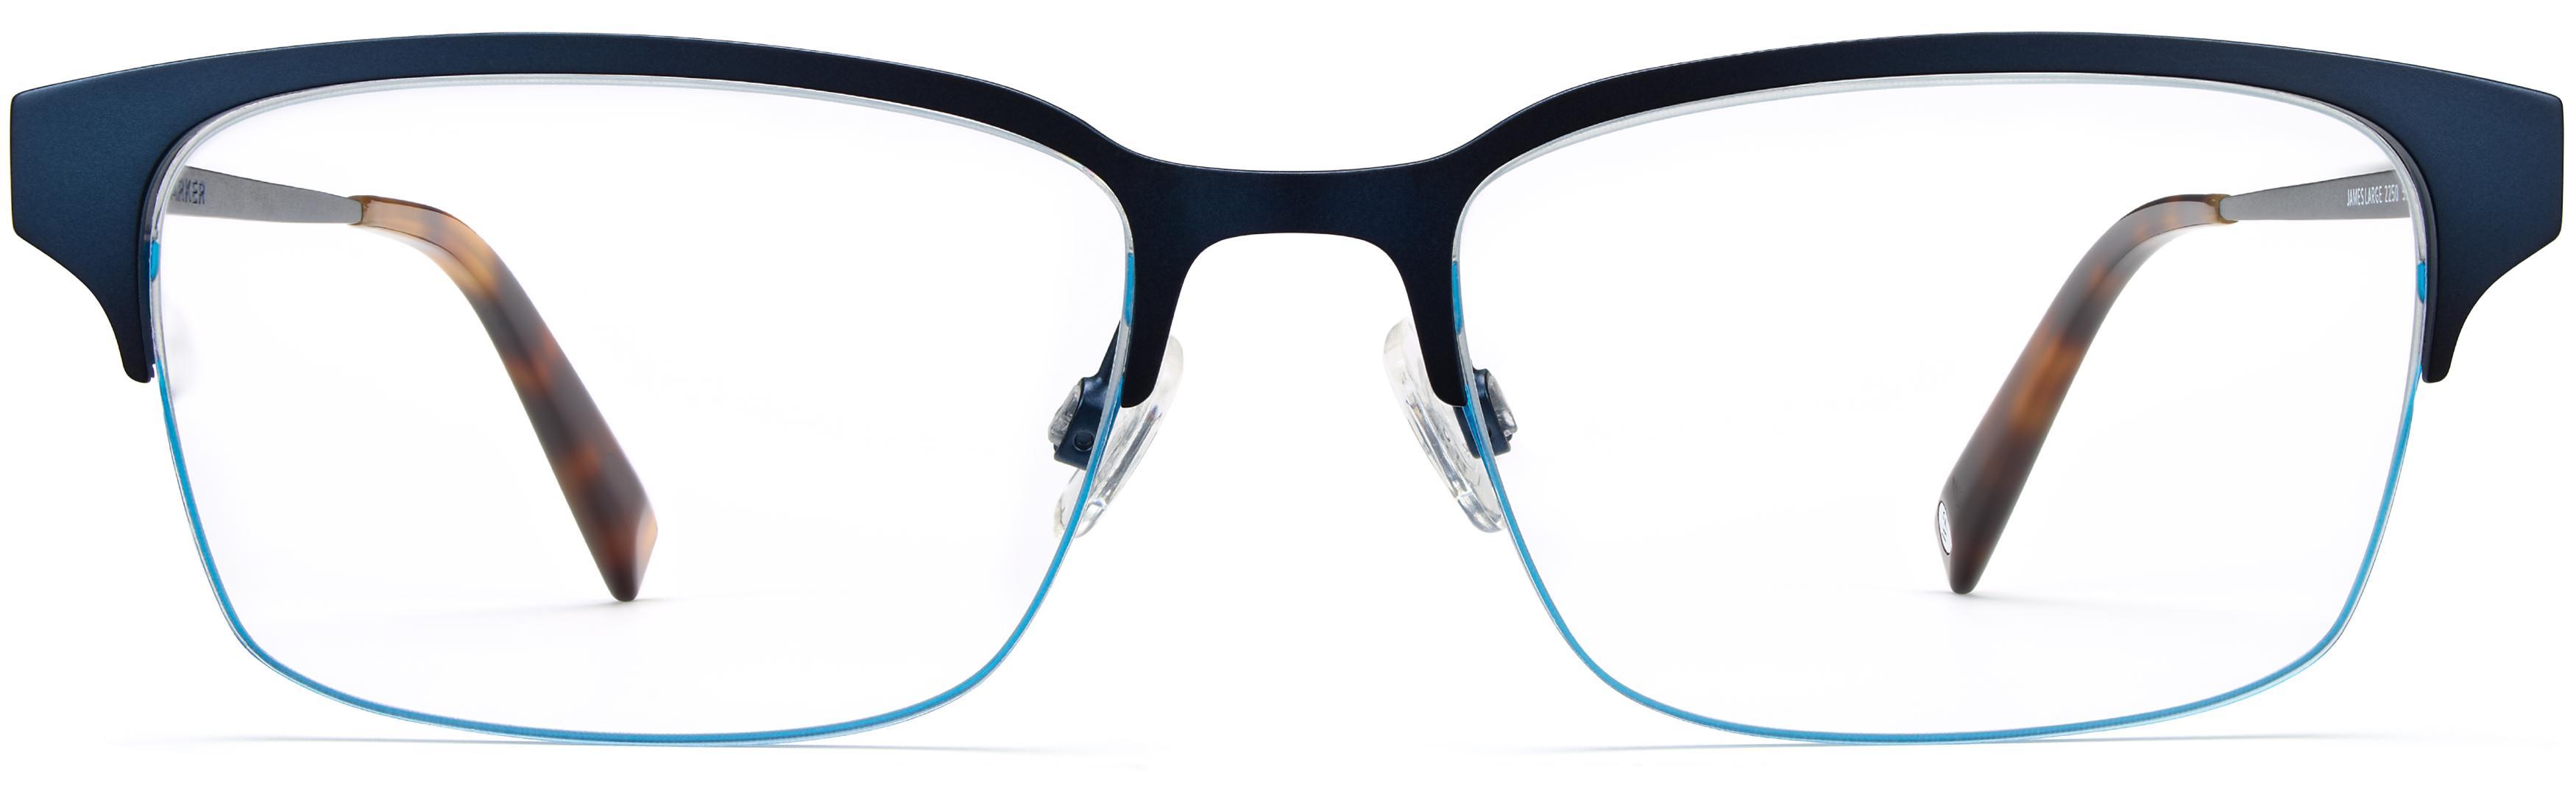 83dcc4fc4dc Men s Eyeglasses